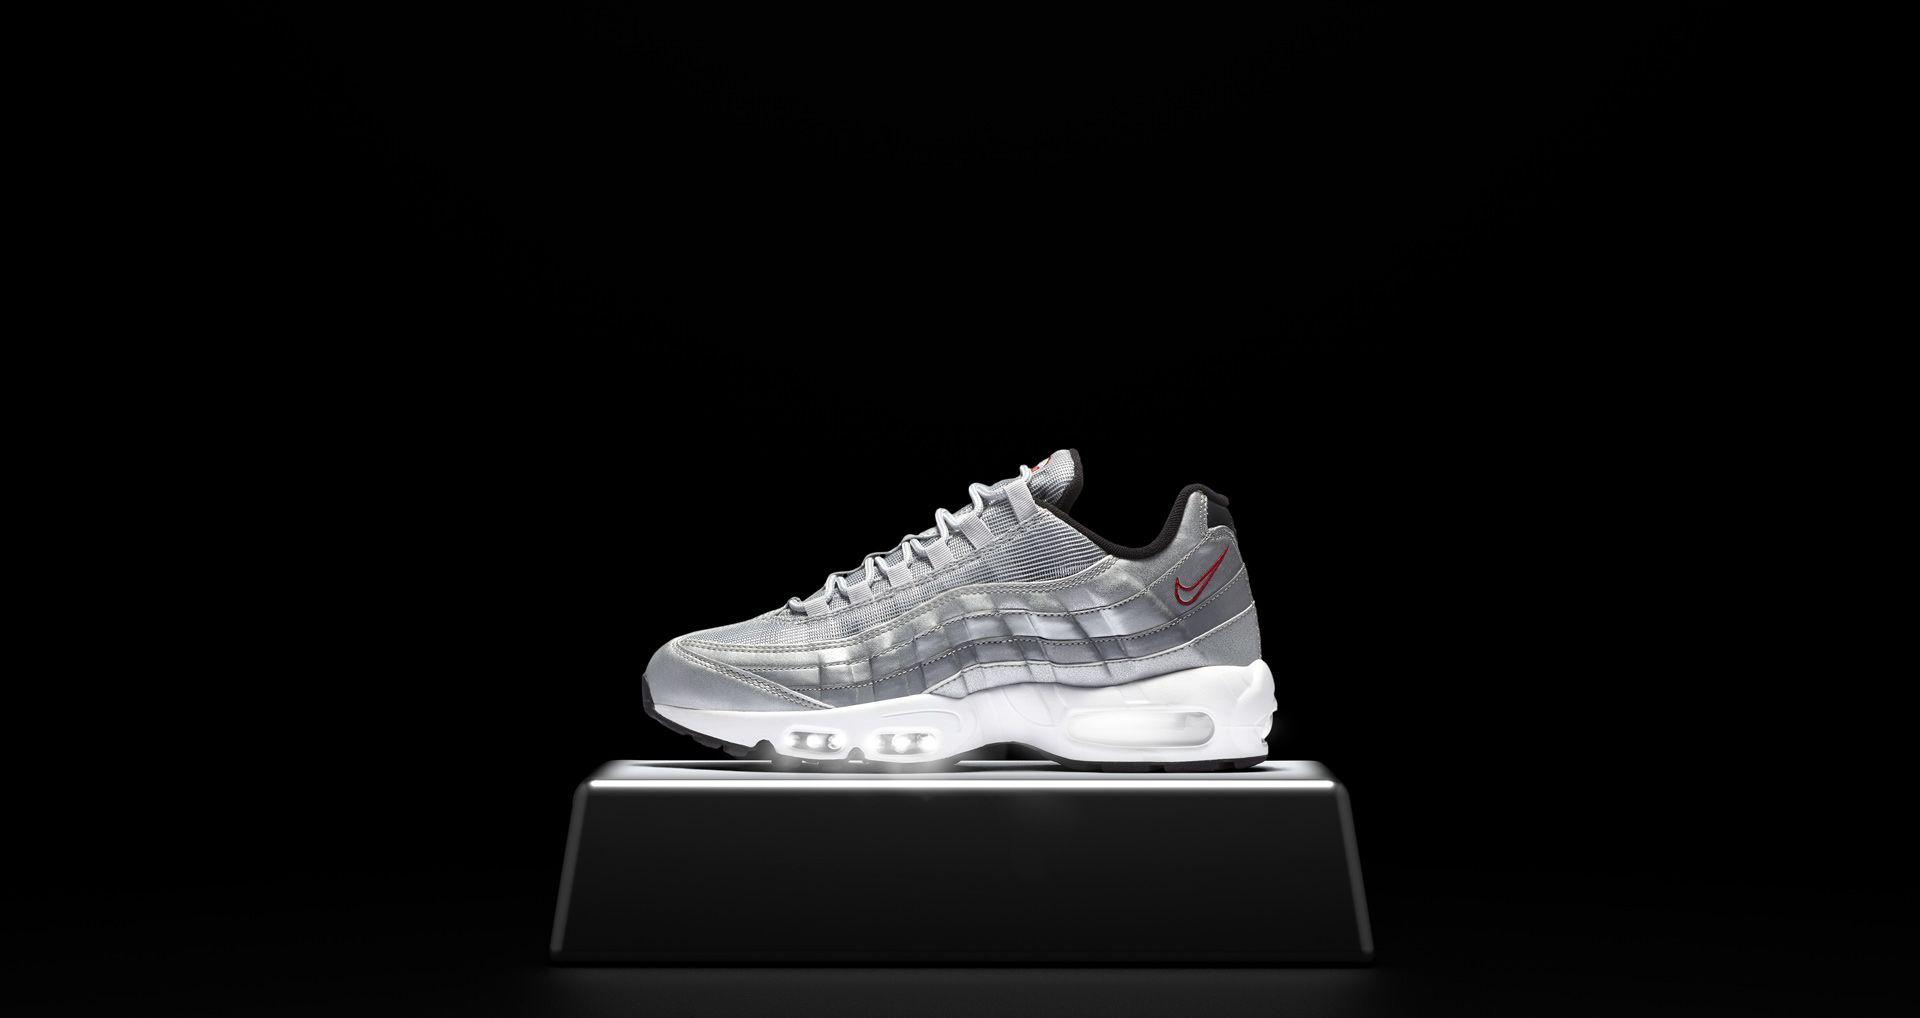 b5fc75e0f4 Nike Air Max 95 Premium 'Metallic Silver'. Nike+ SNKRS